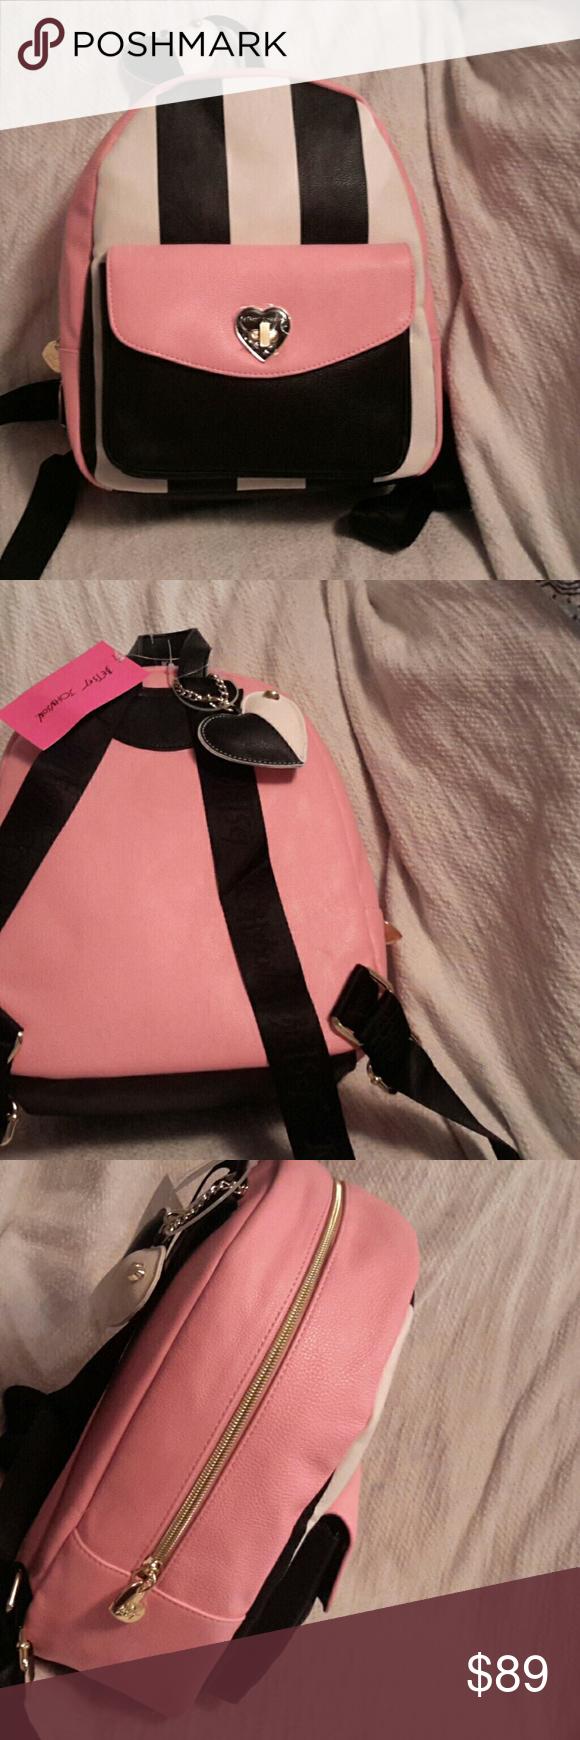 Betsey johnson backpack with heart dangle NWT Turlock med be mine stripe pink, black, white. (ML) Betsey Johnson Bags Backpacks